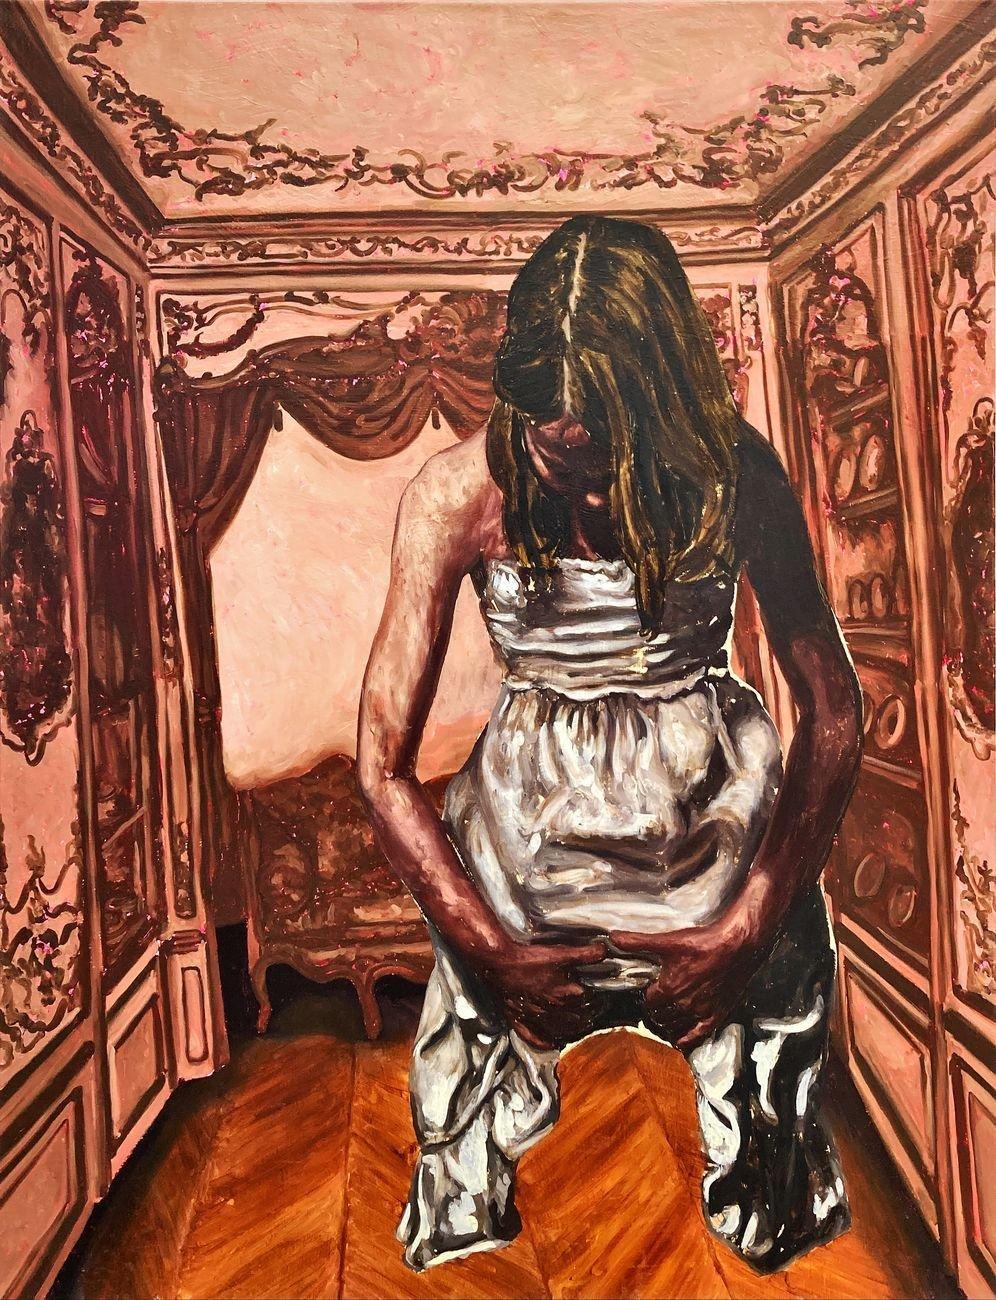 Ryan Mendoza, Untitled, 2019, olio su lino, cm 188x144